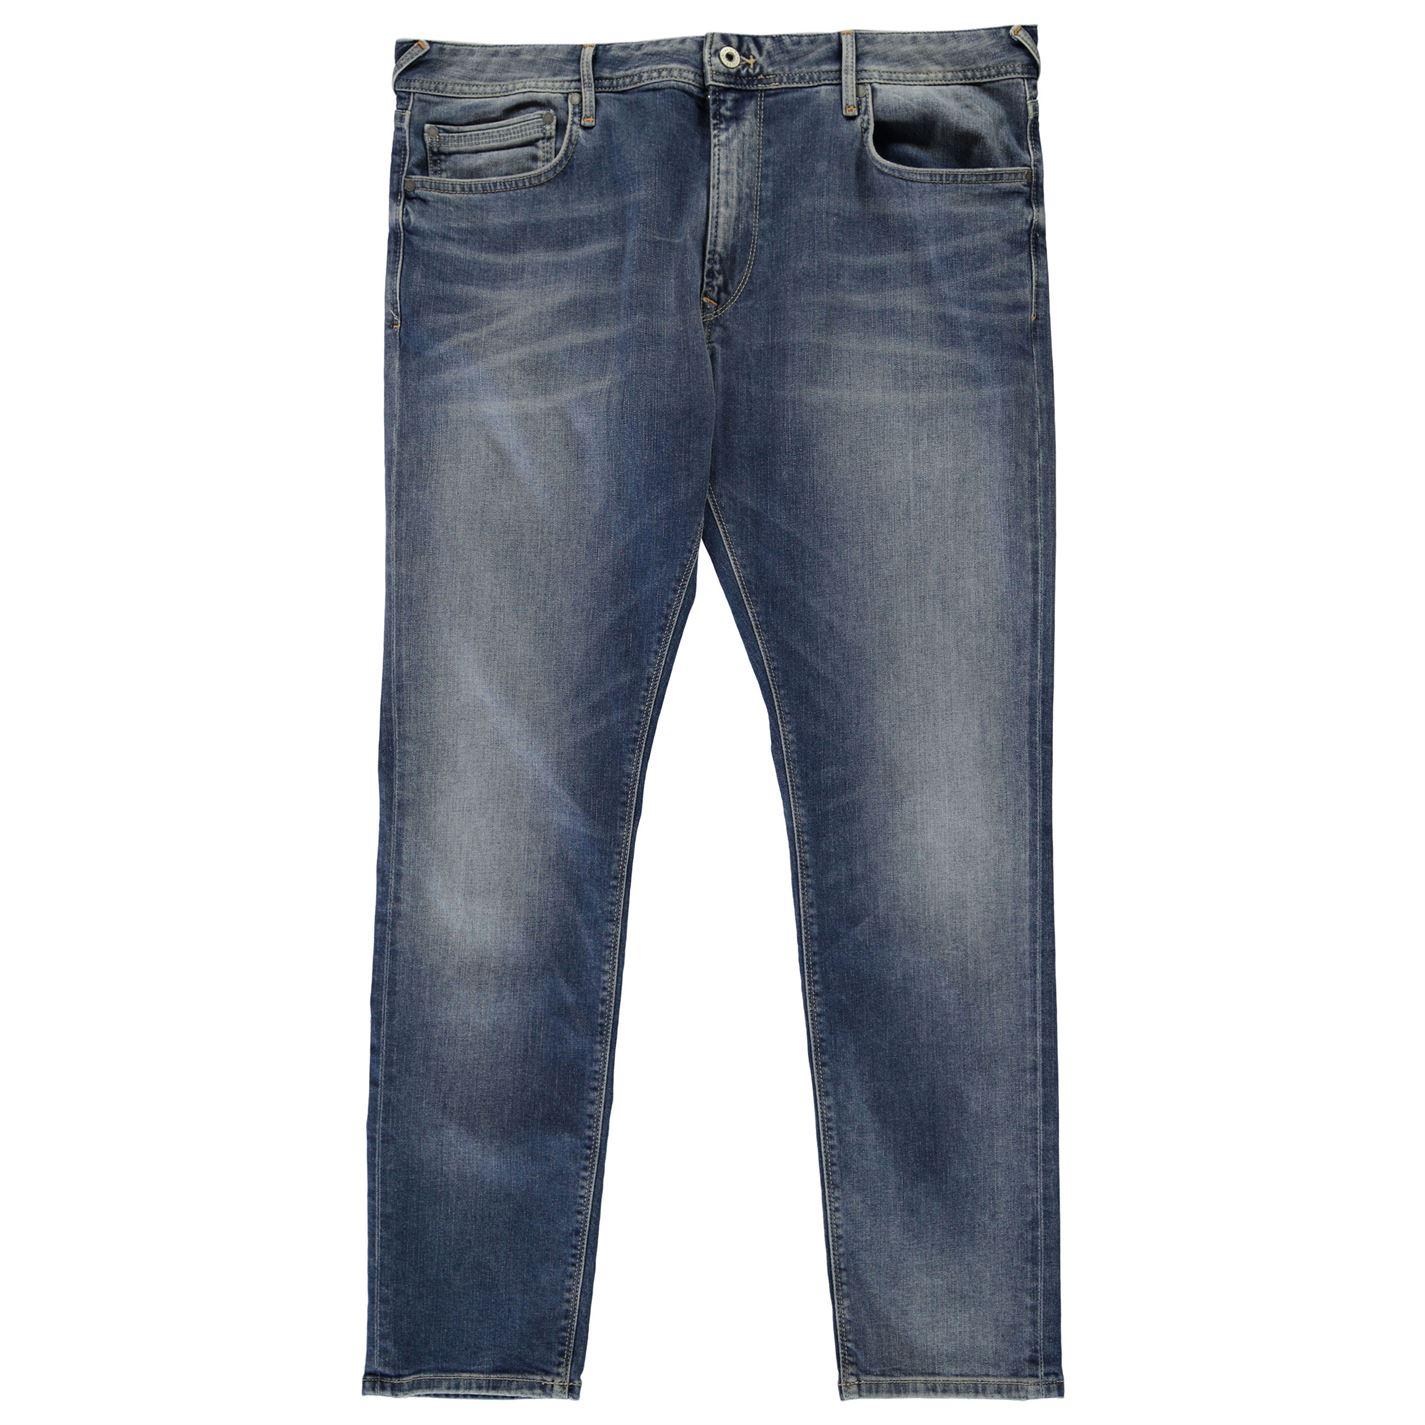 Mergi la Blugi Pepe Jeans Stanley 45th pentru Barbati maro deschis wash